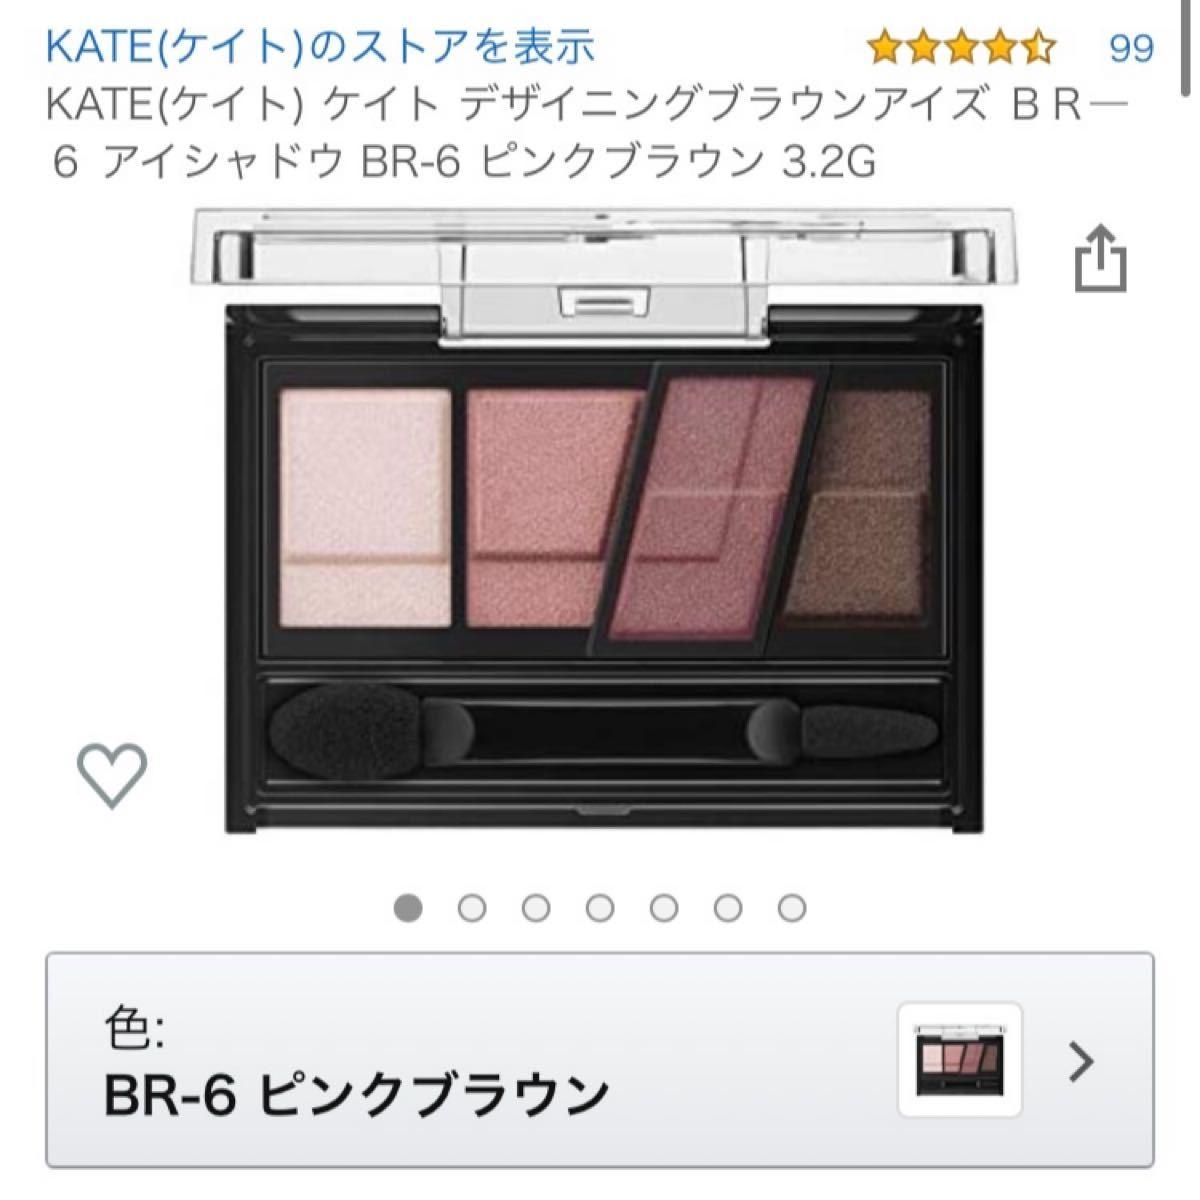 KATE デザイニングブラウンアイズ BR-6 ピンクブラウン